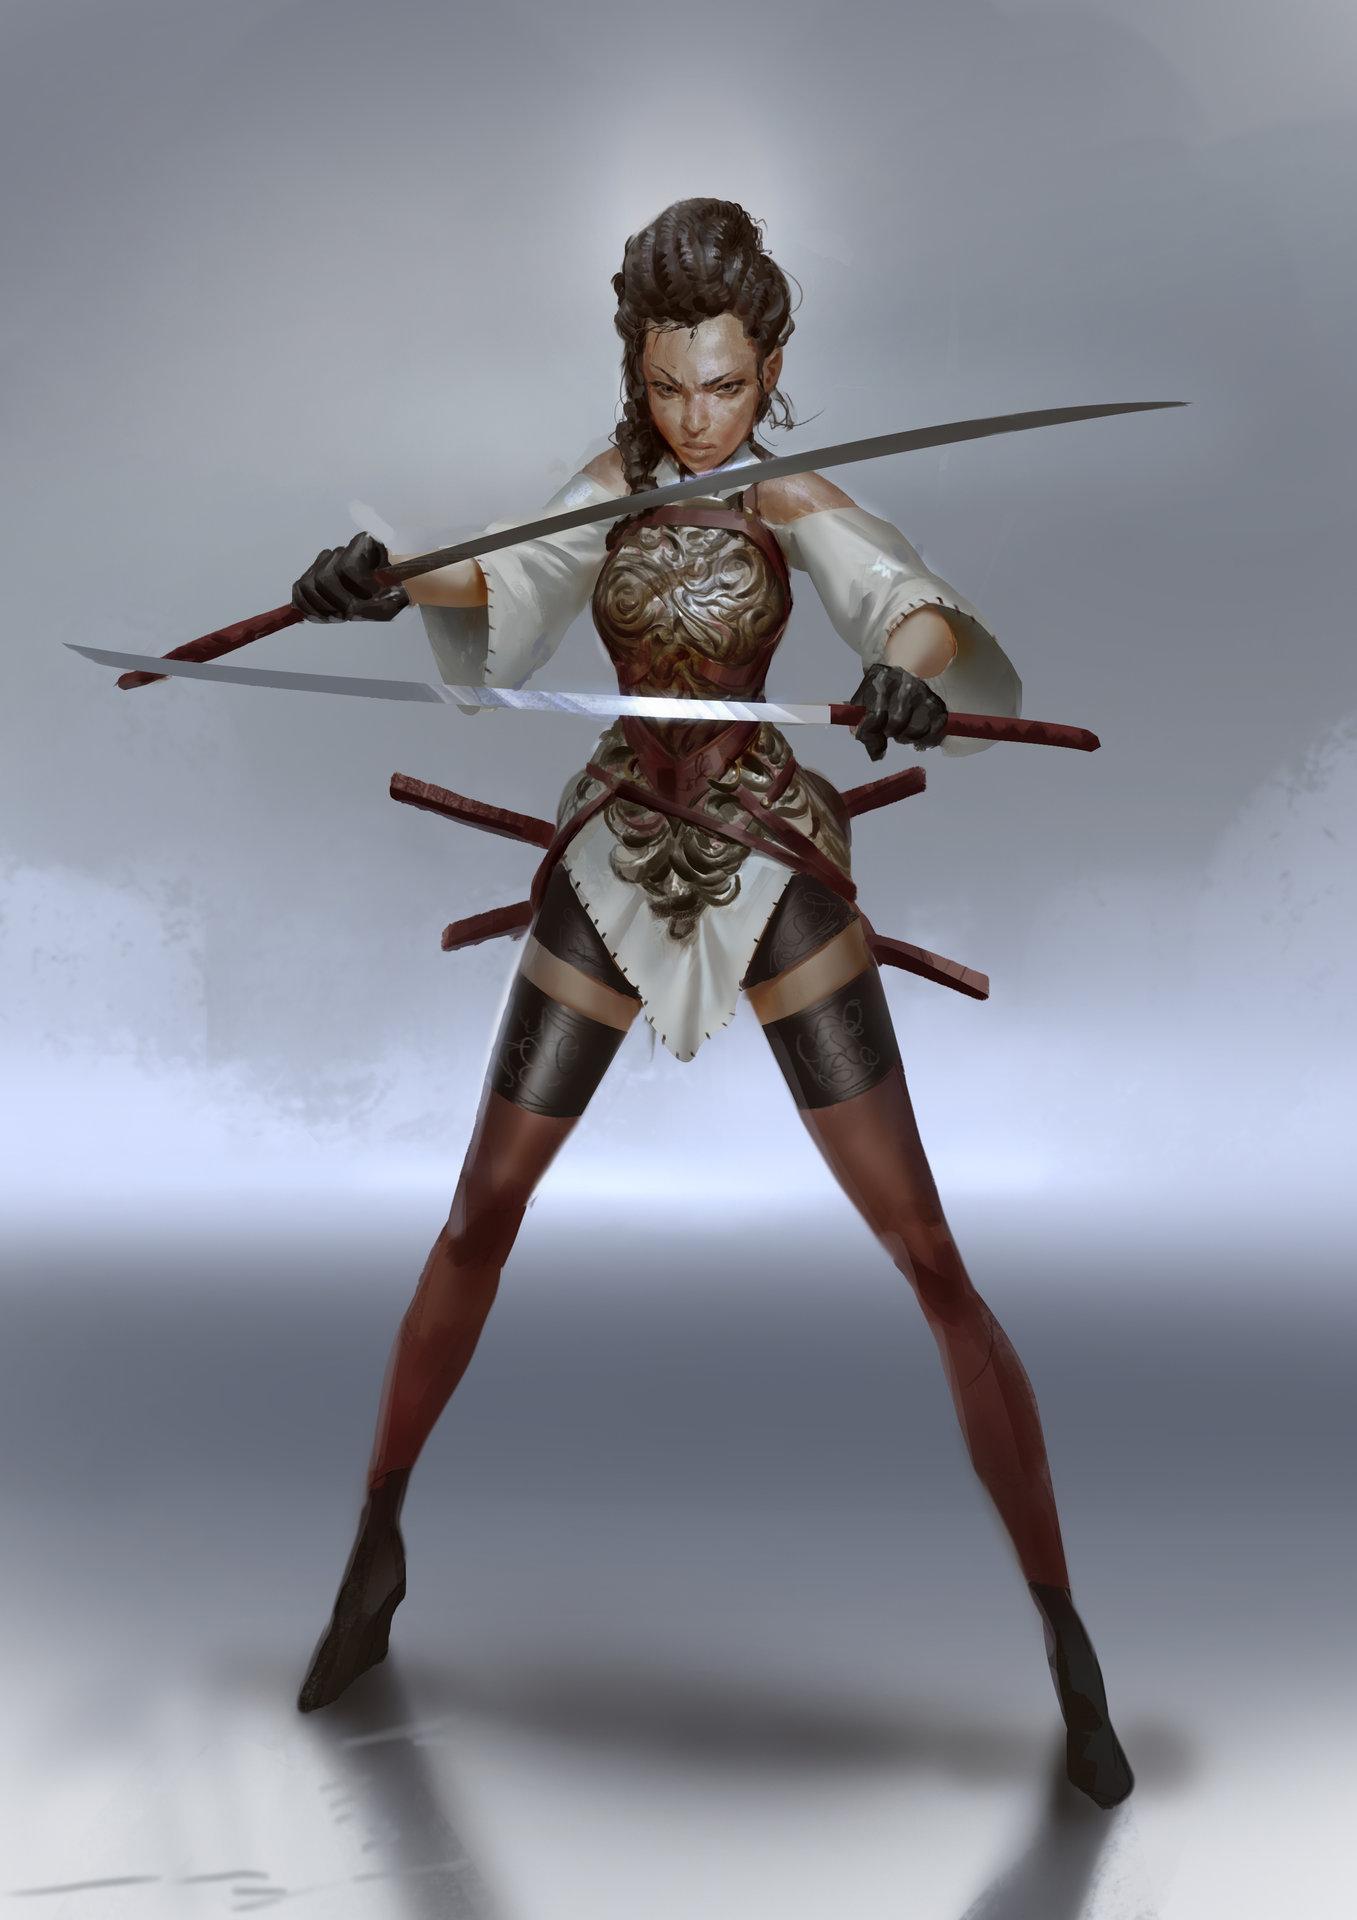 Even amundsen sword lady2